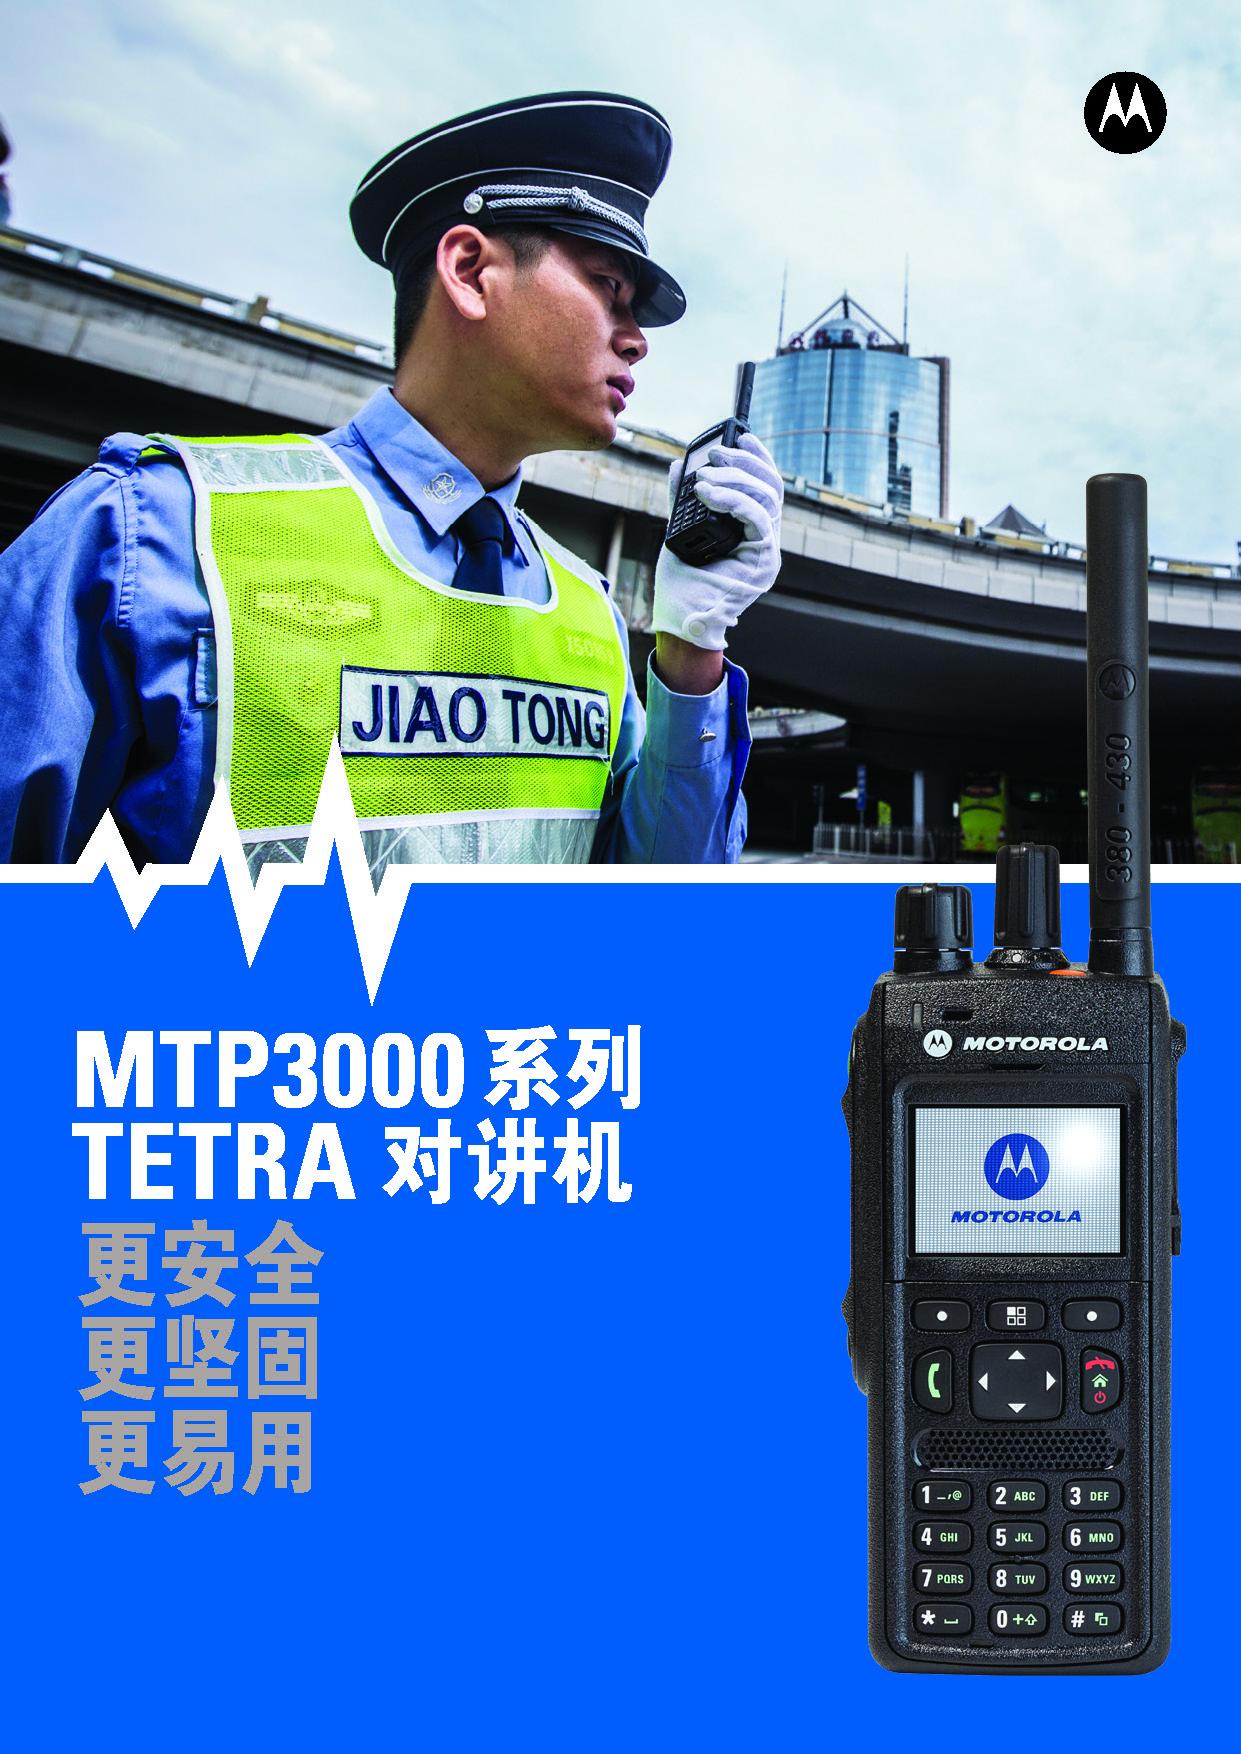 MTP3000_Series_頁面_1